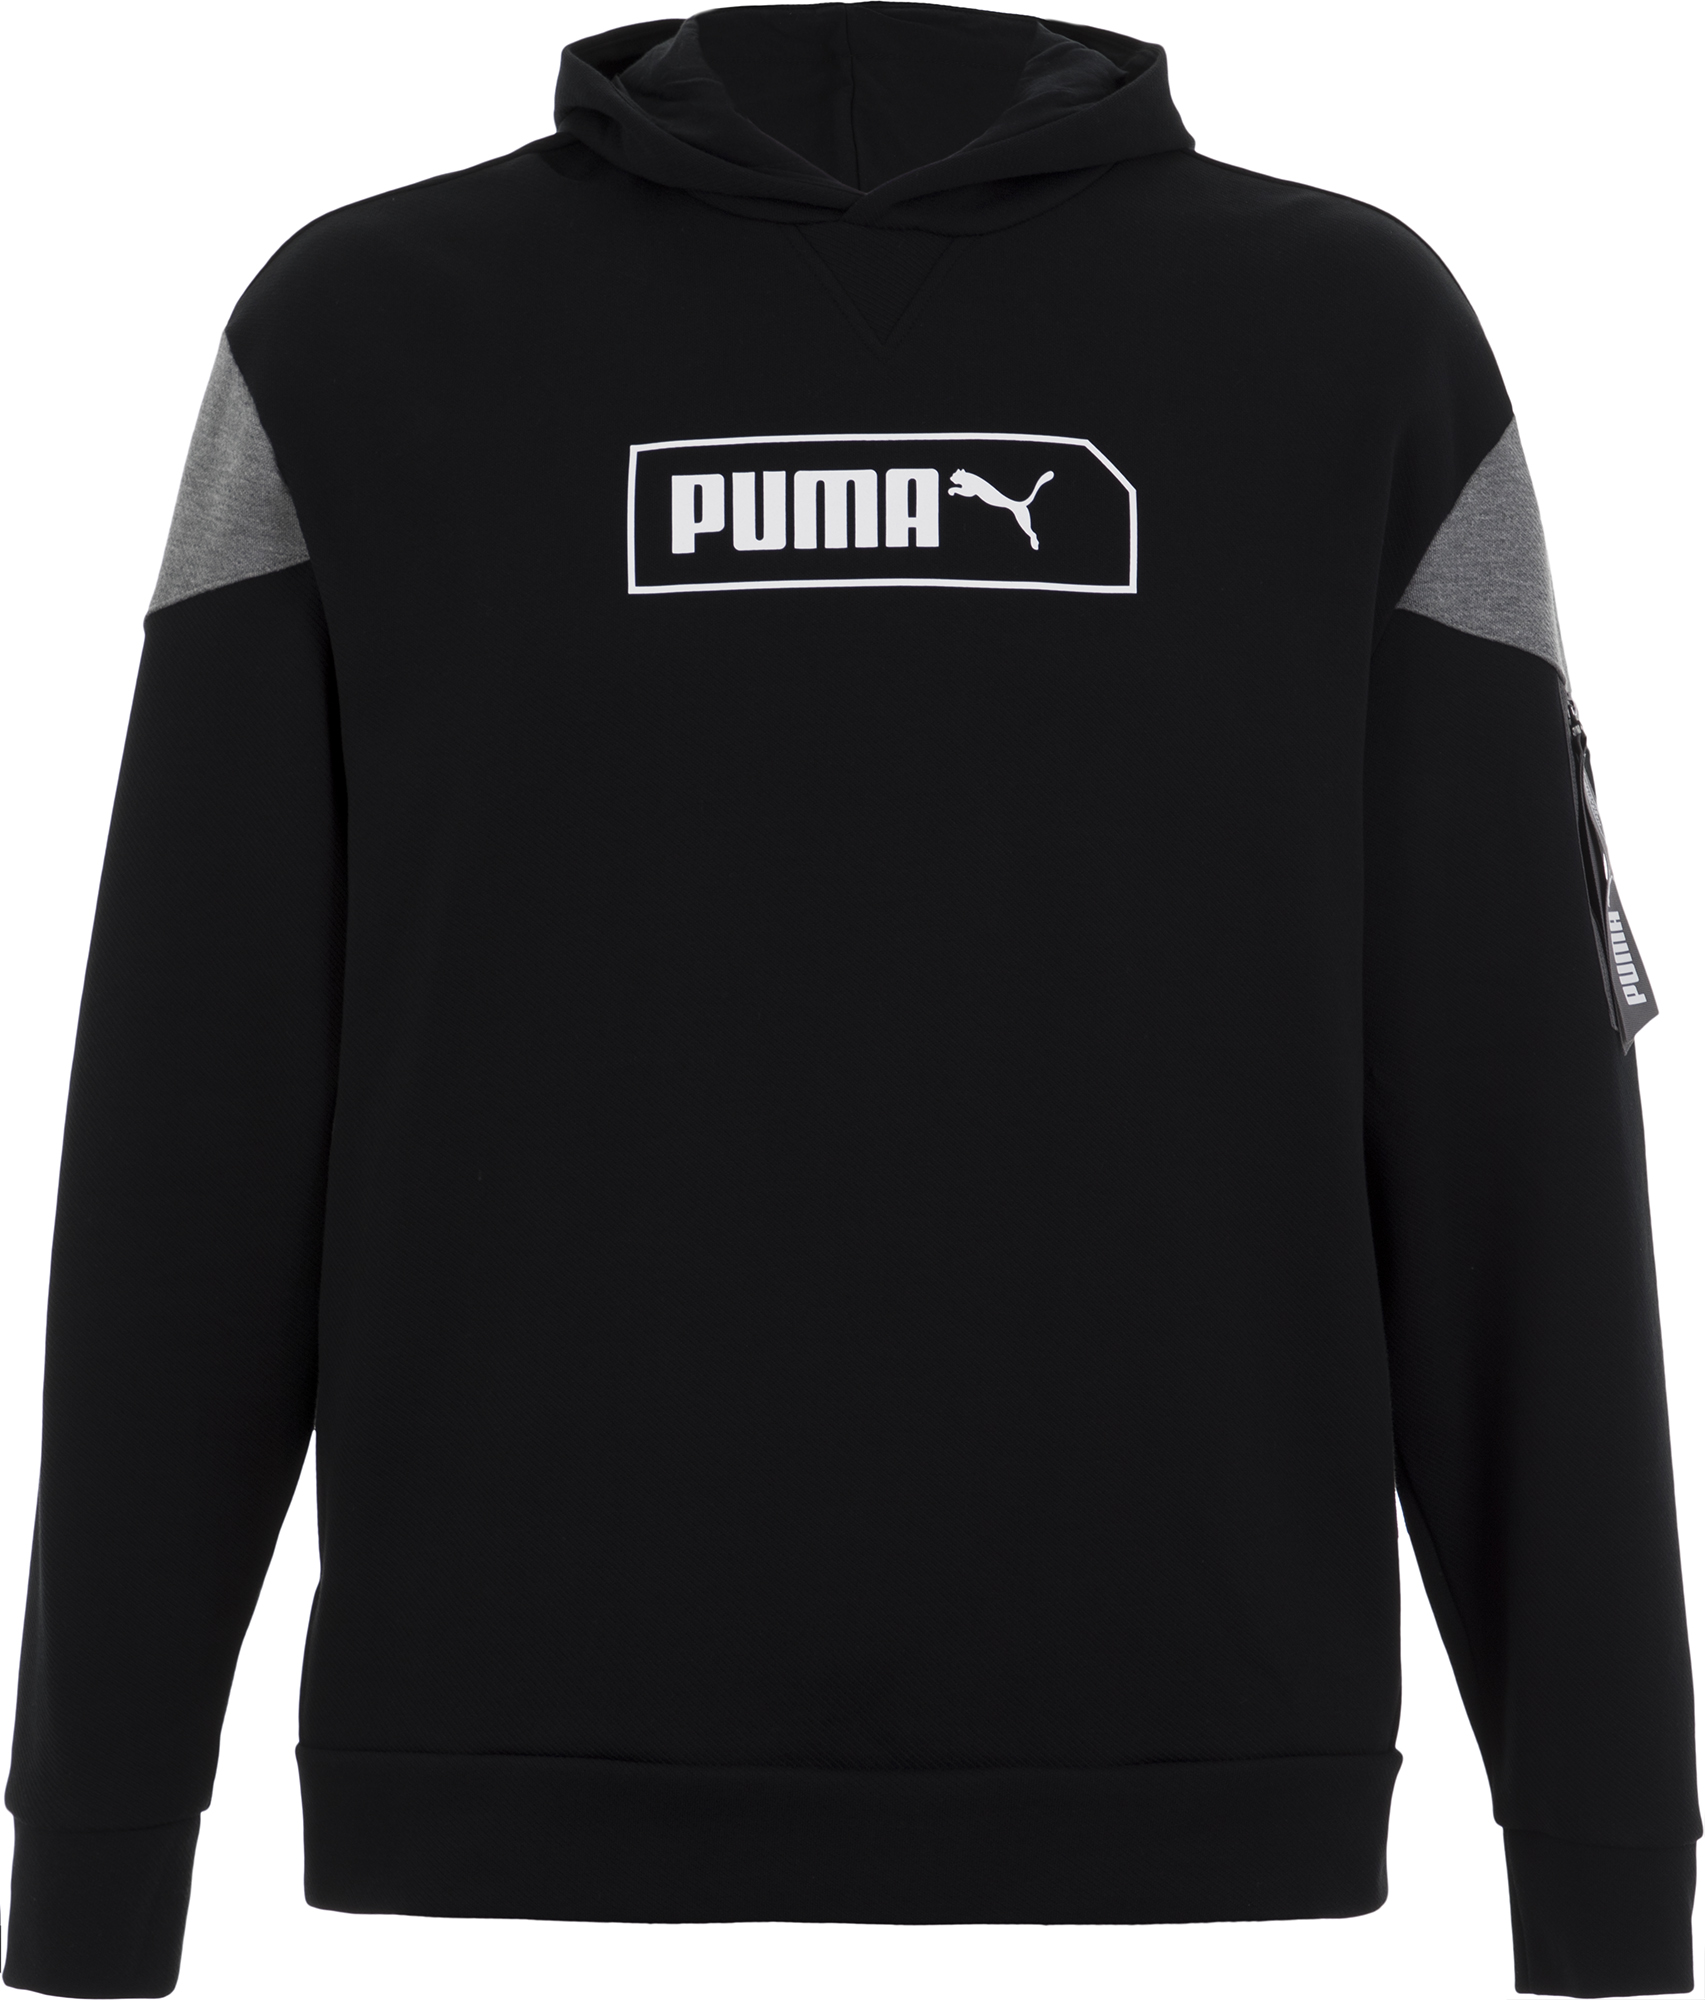 Puma Худи мужская Puma NU-TILITY, размер 50-52